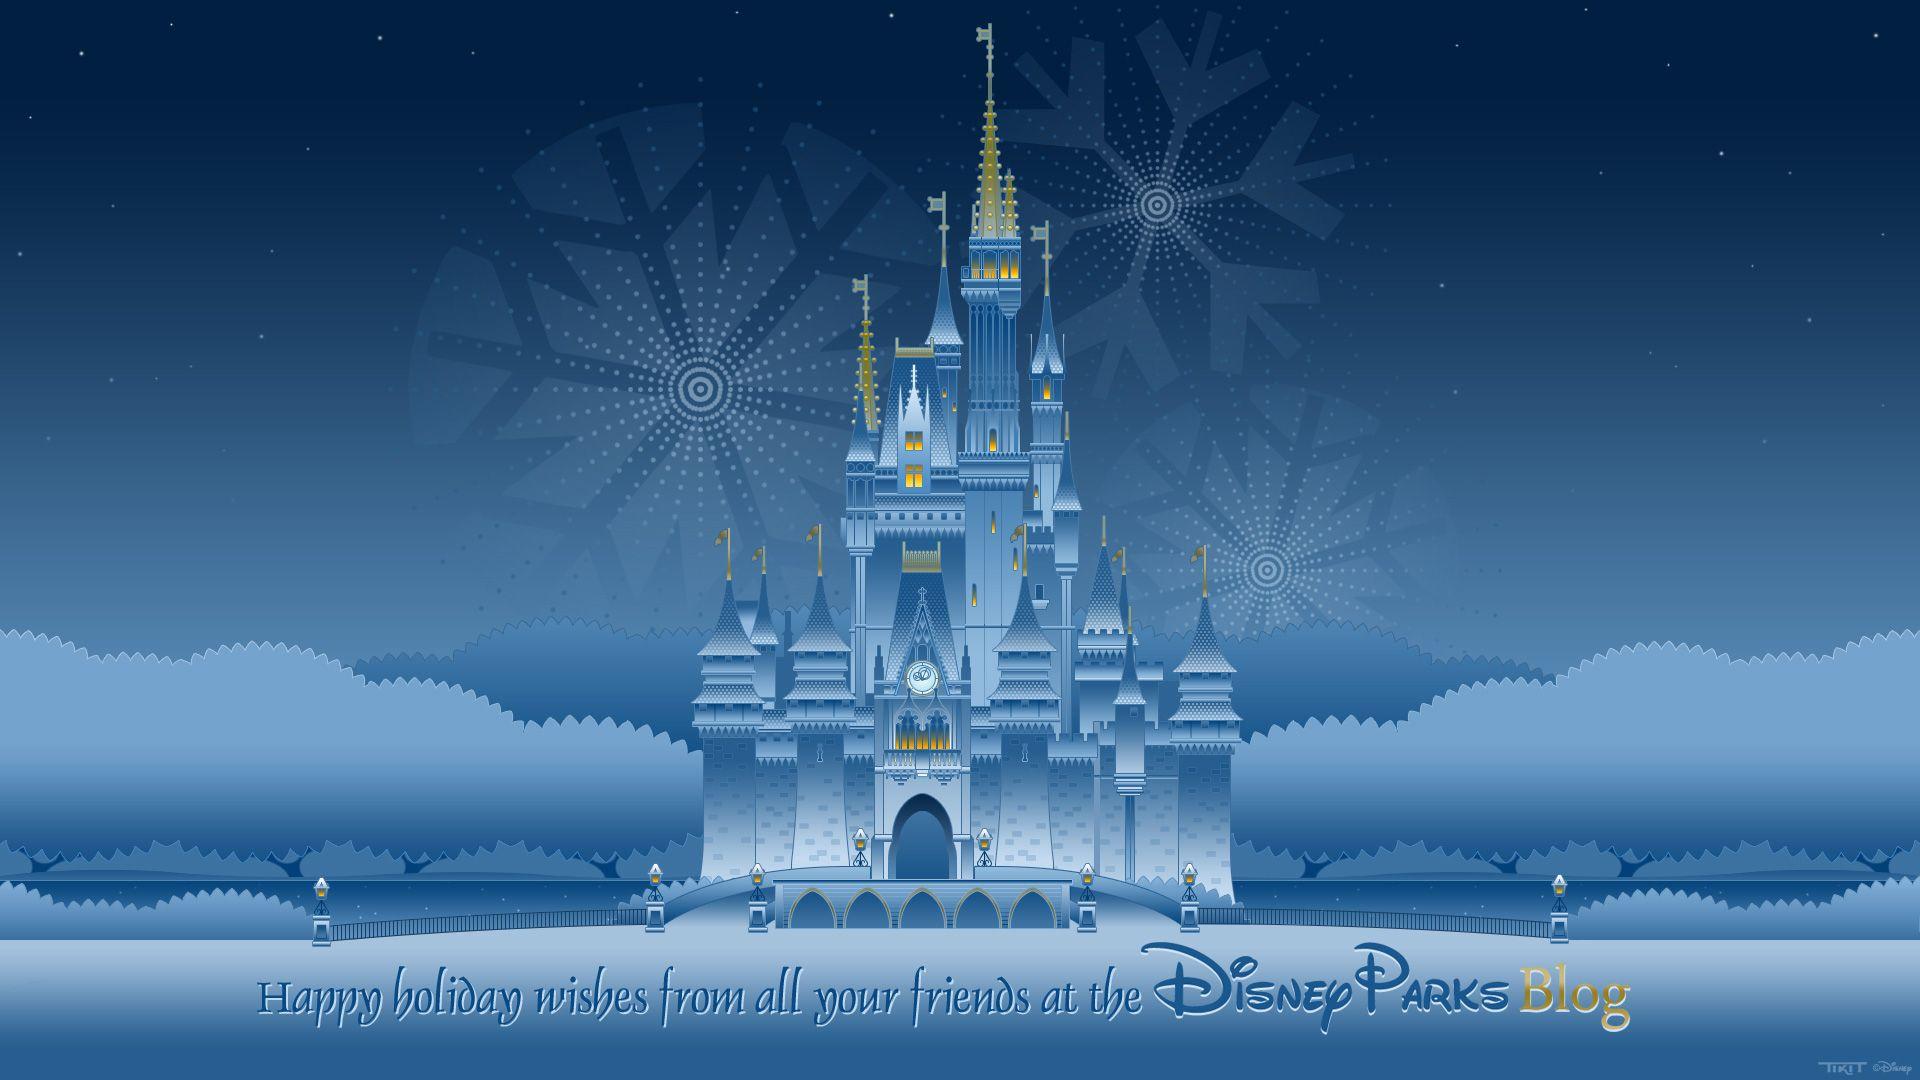 Disney Tumblr Mac Pro Wallpapers Wallpaper Cave